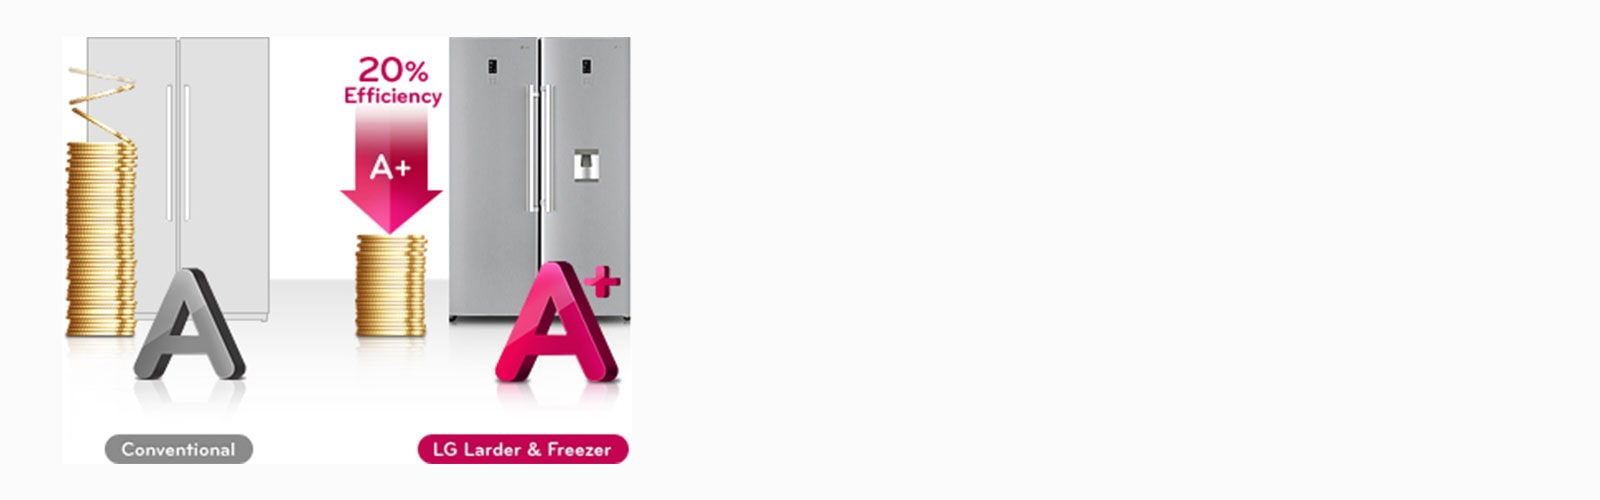 lg-refrigerator-lansen-feature_Energy_Saving_D